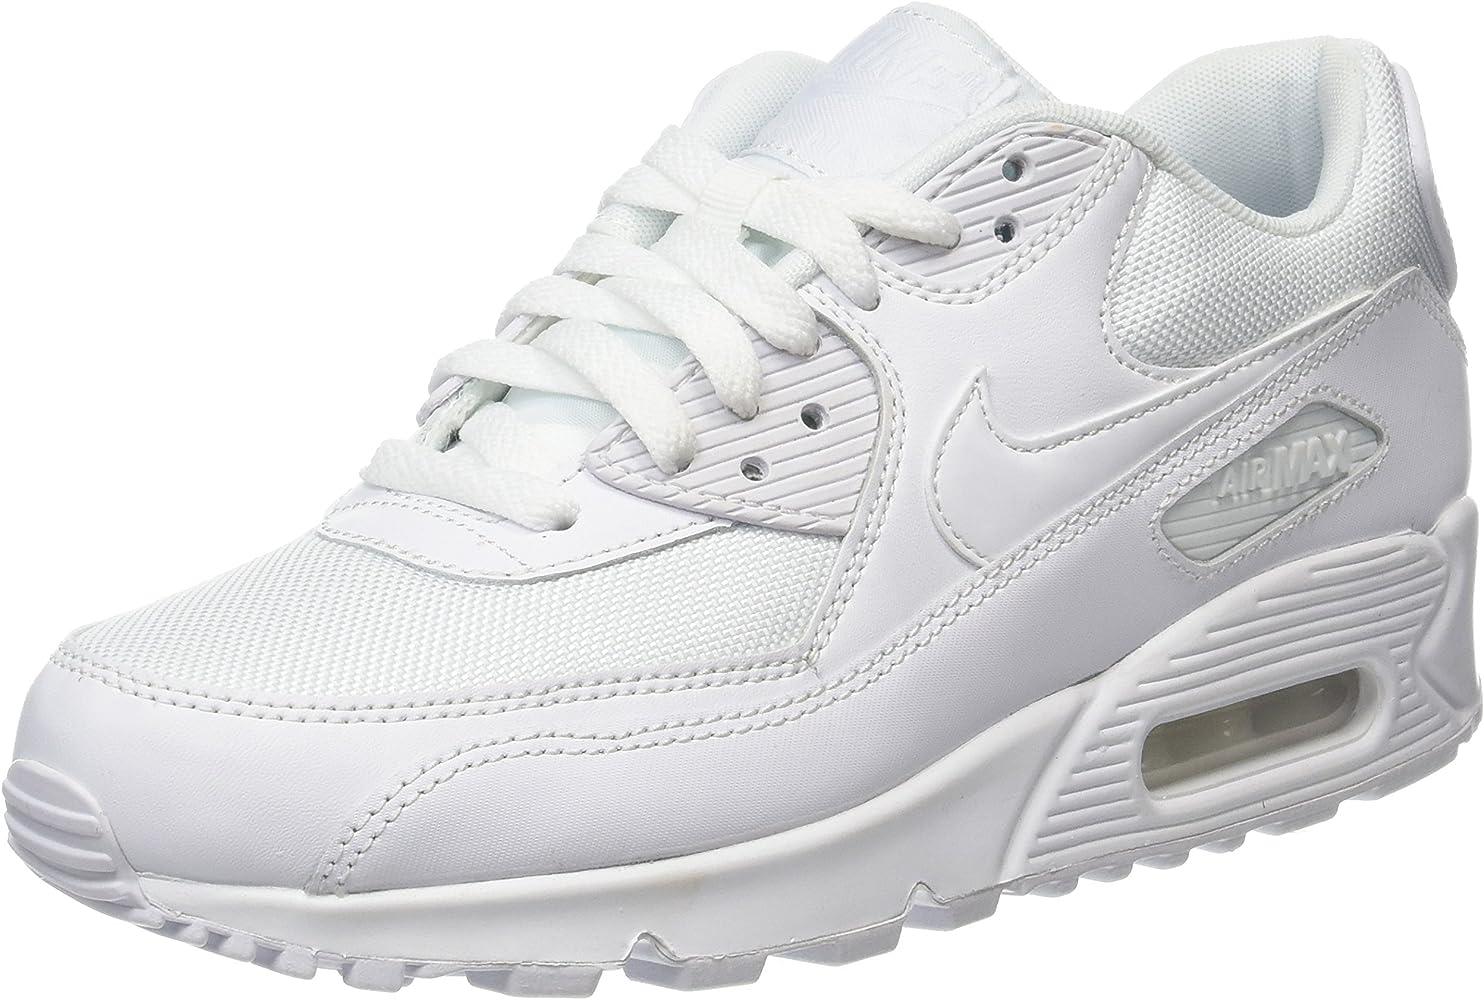 Nike Air Max 90 Essential White White White White 537384 111